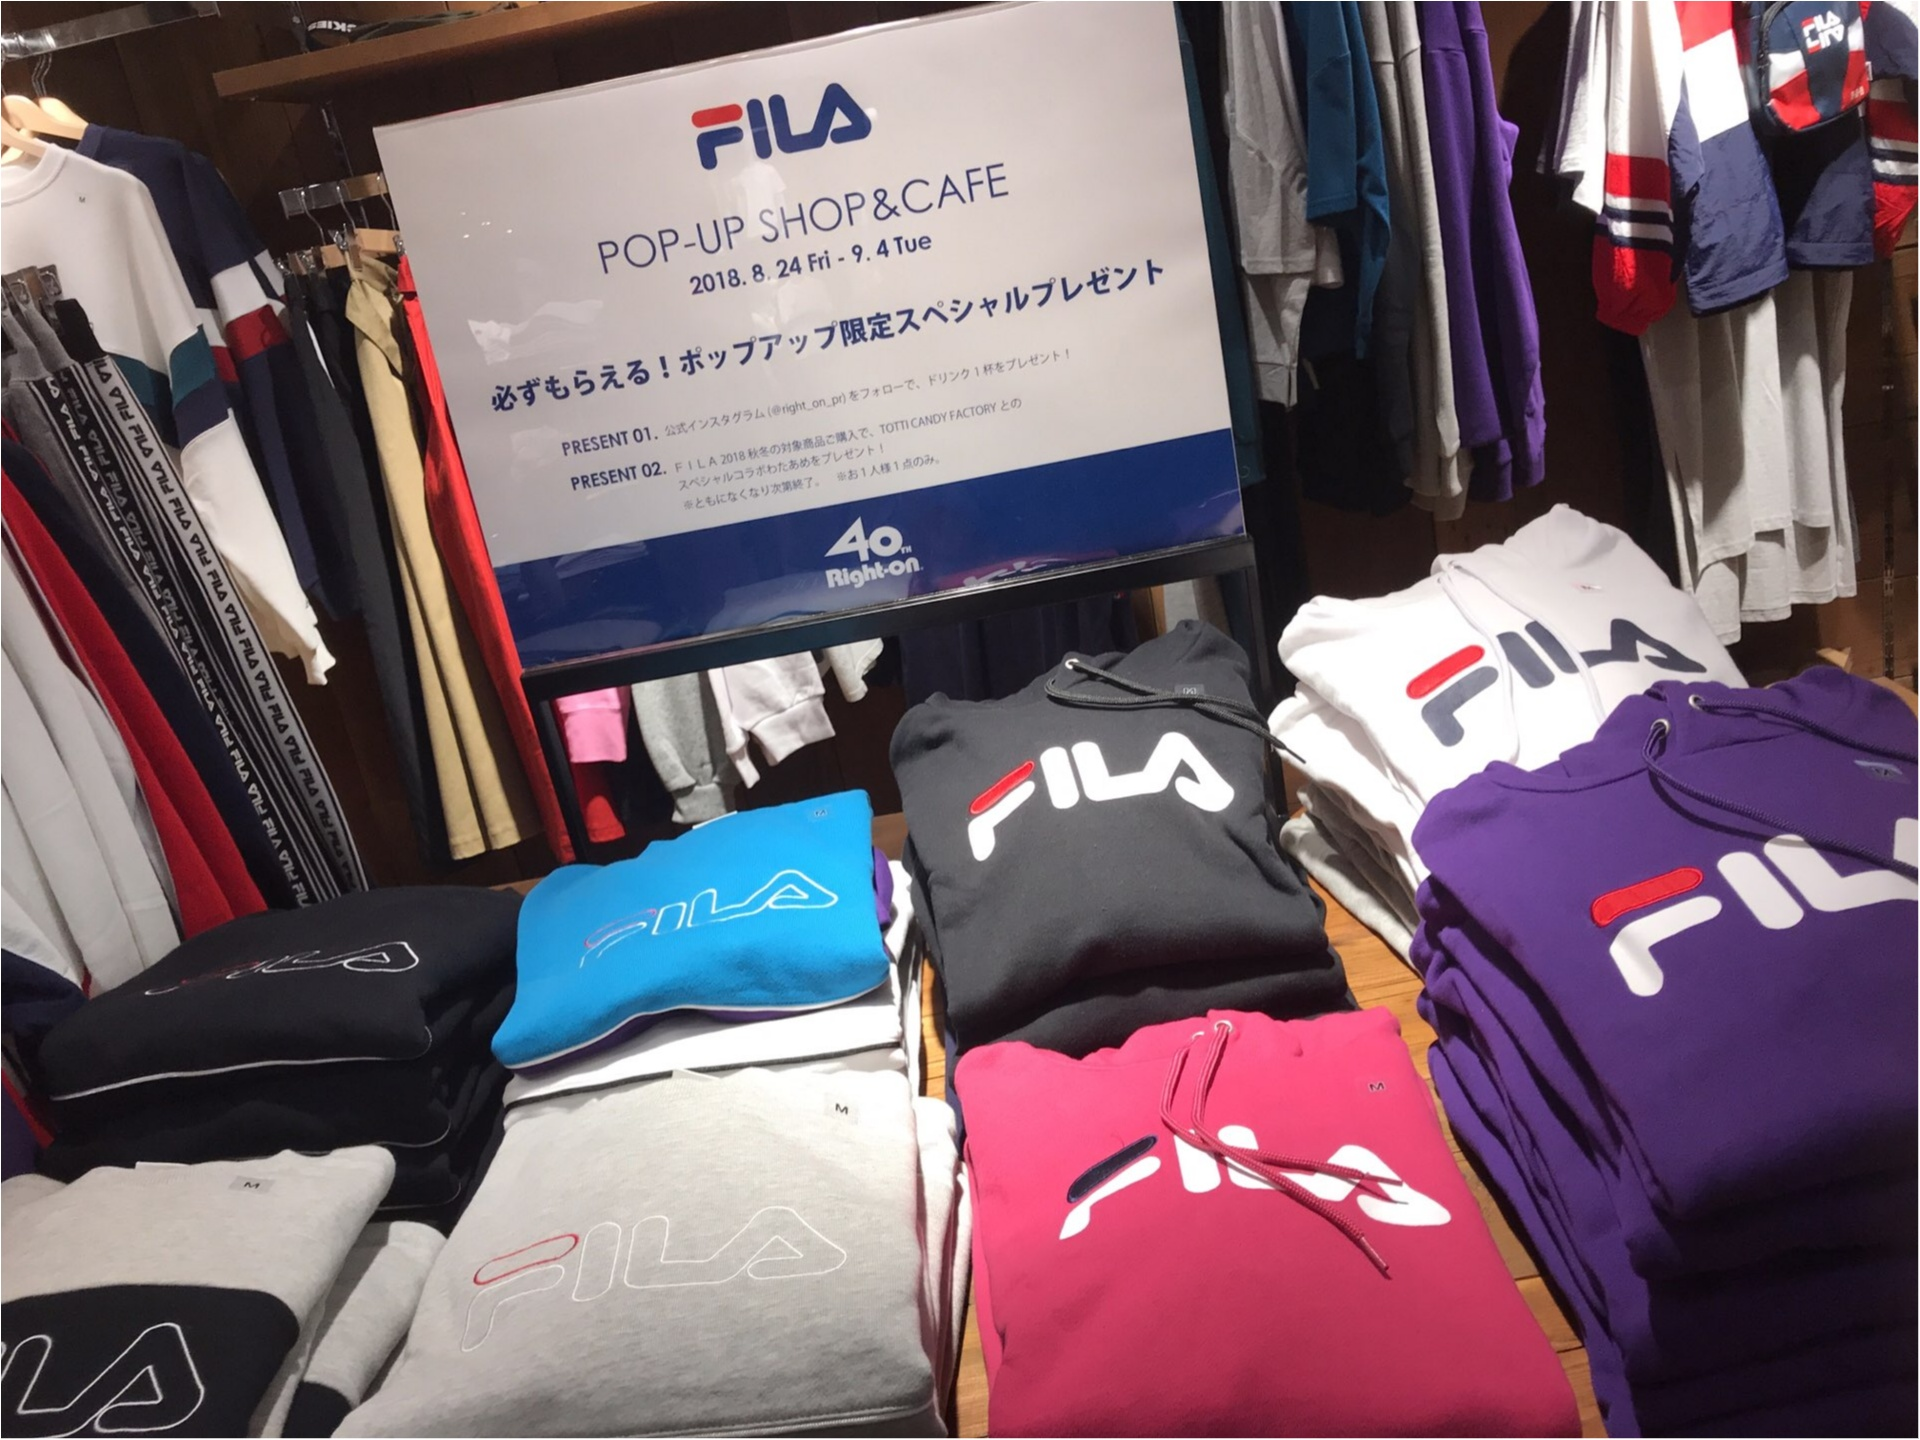 【FILA(フィラ)】がRight-onをジャック!?POP-UPSHOP&CAFEがオープン★_2